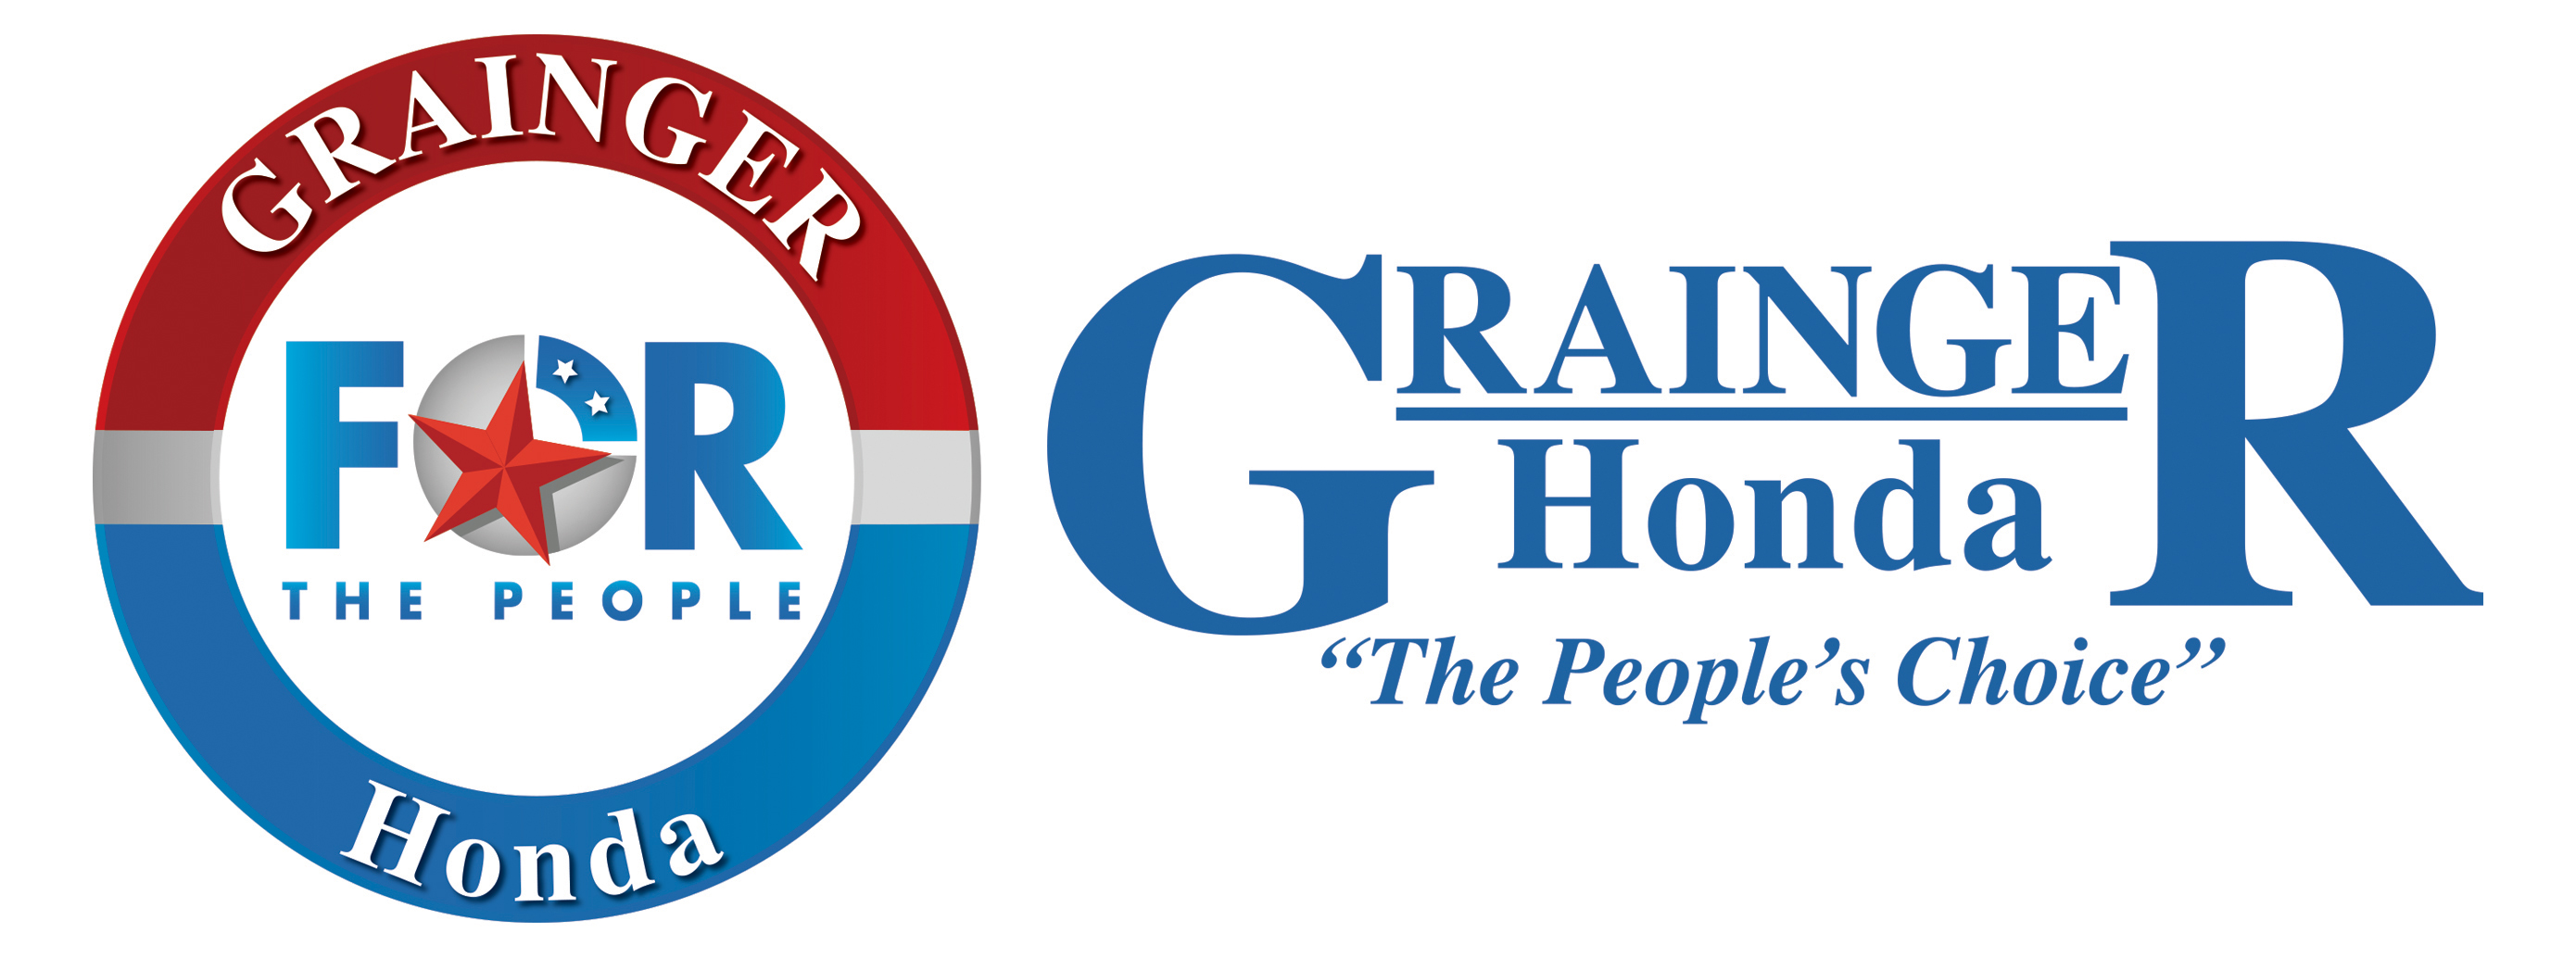 Exceptional Grainger Honda In The Community